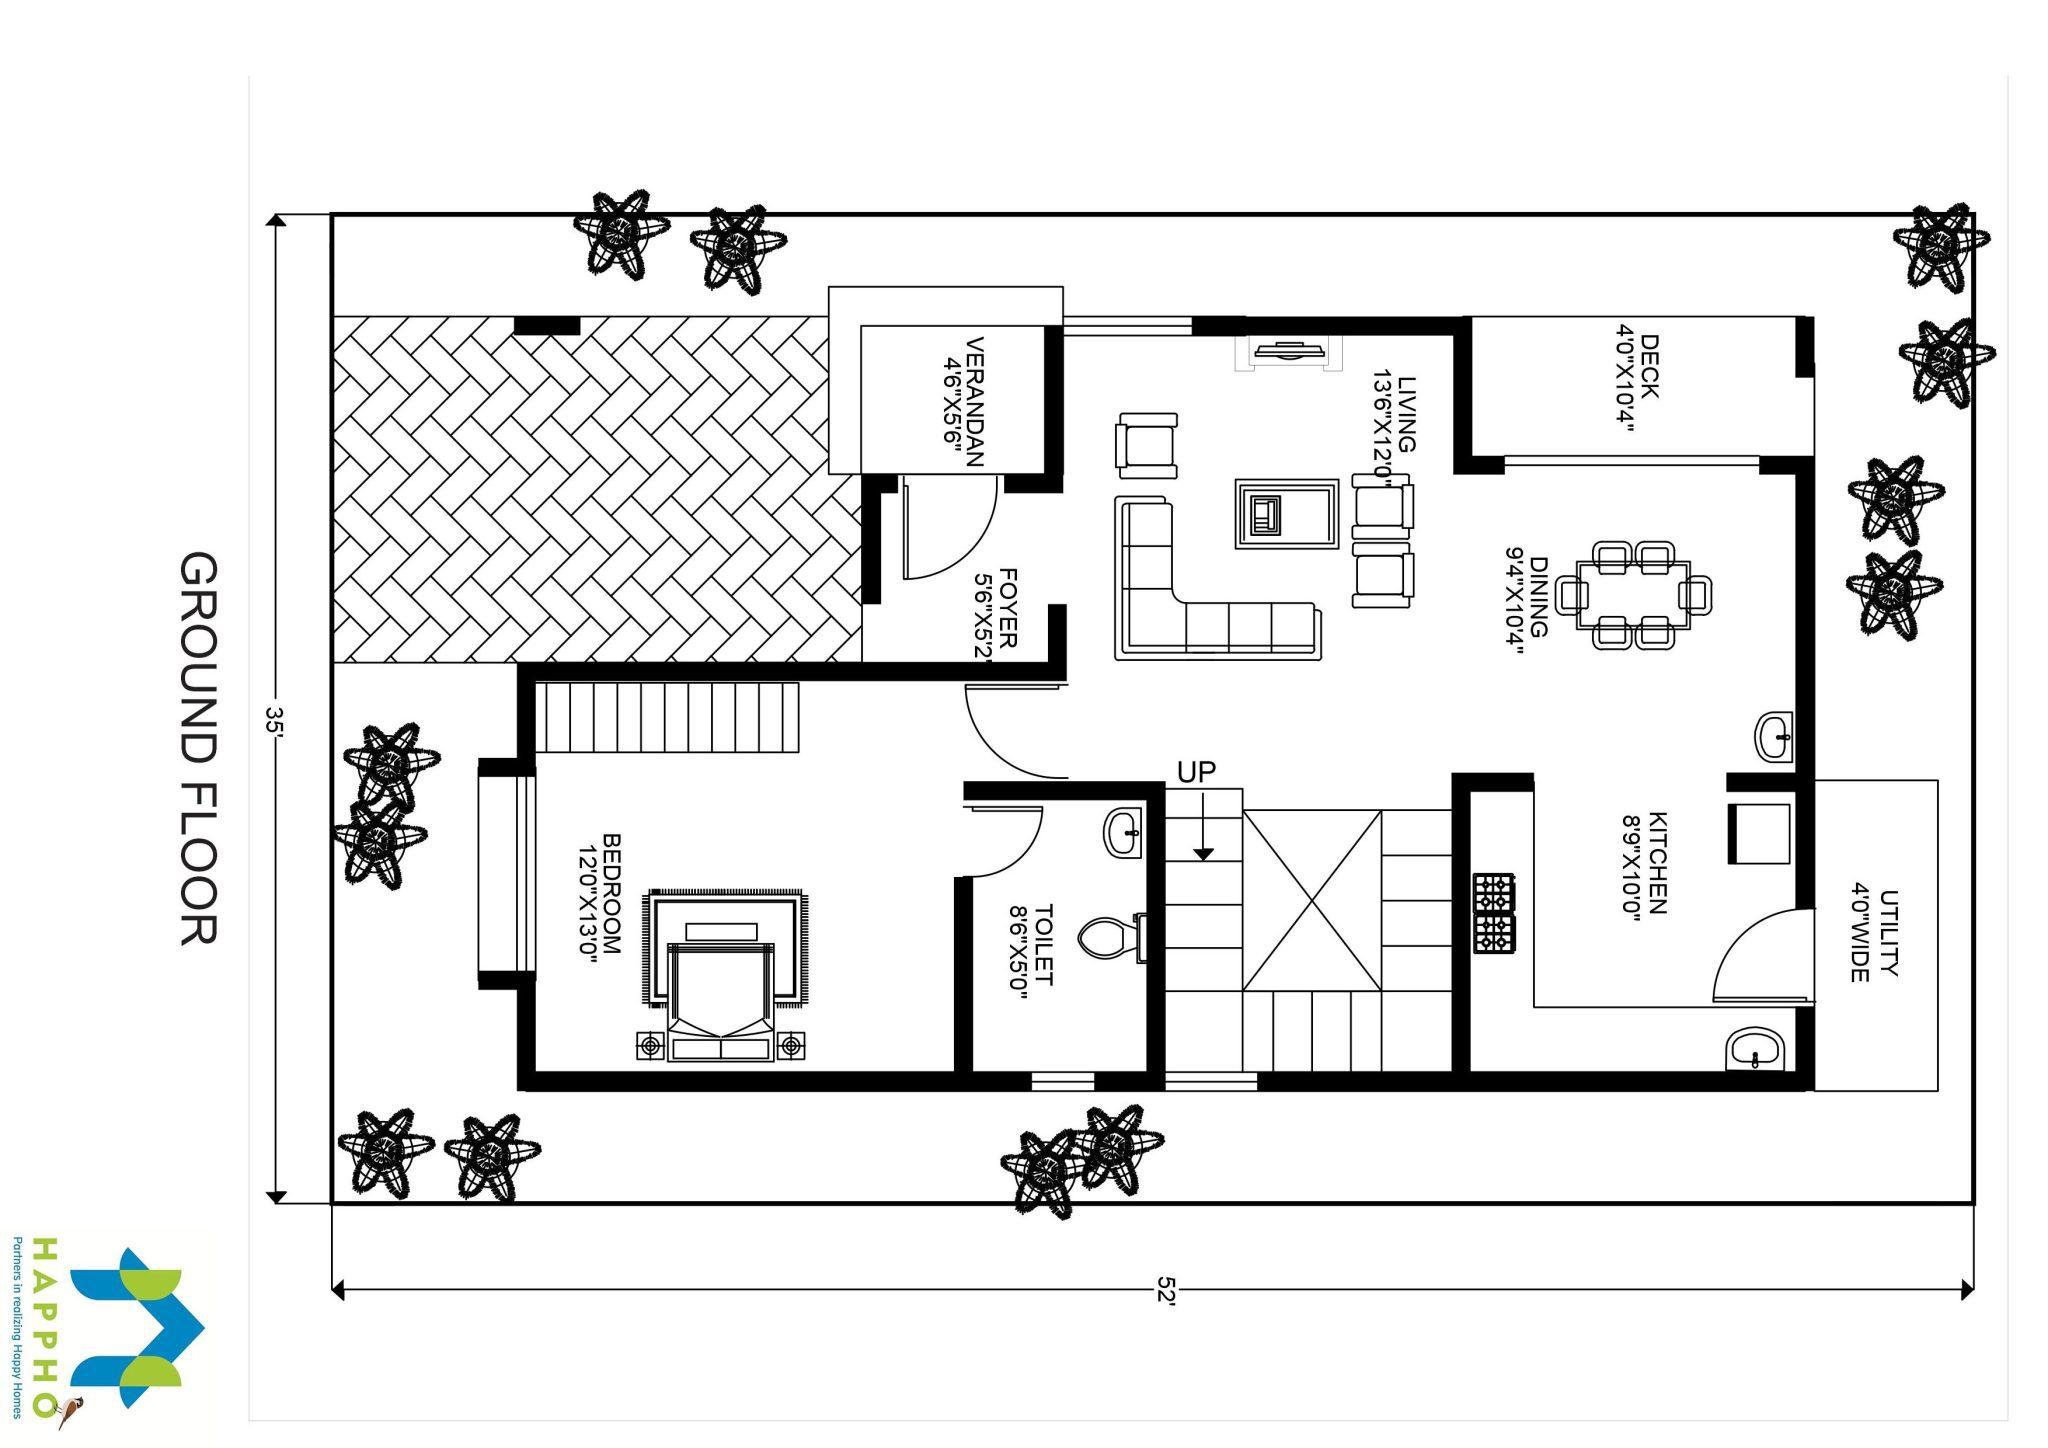 1BHK Floor Plan for 30 X 50 Plot 1500 Square Feet167 SquareYards5  Happho